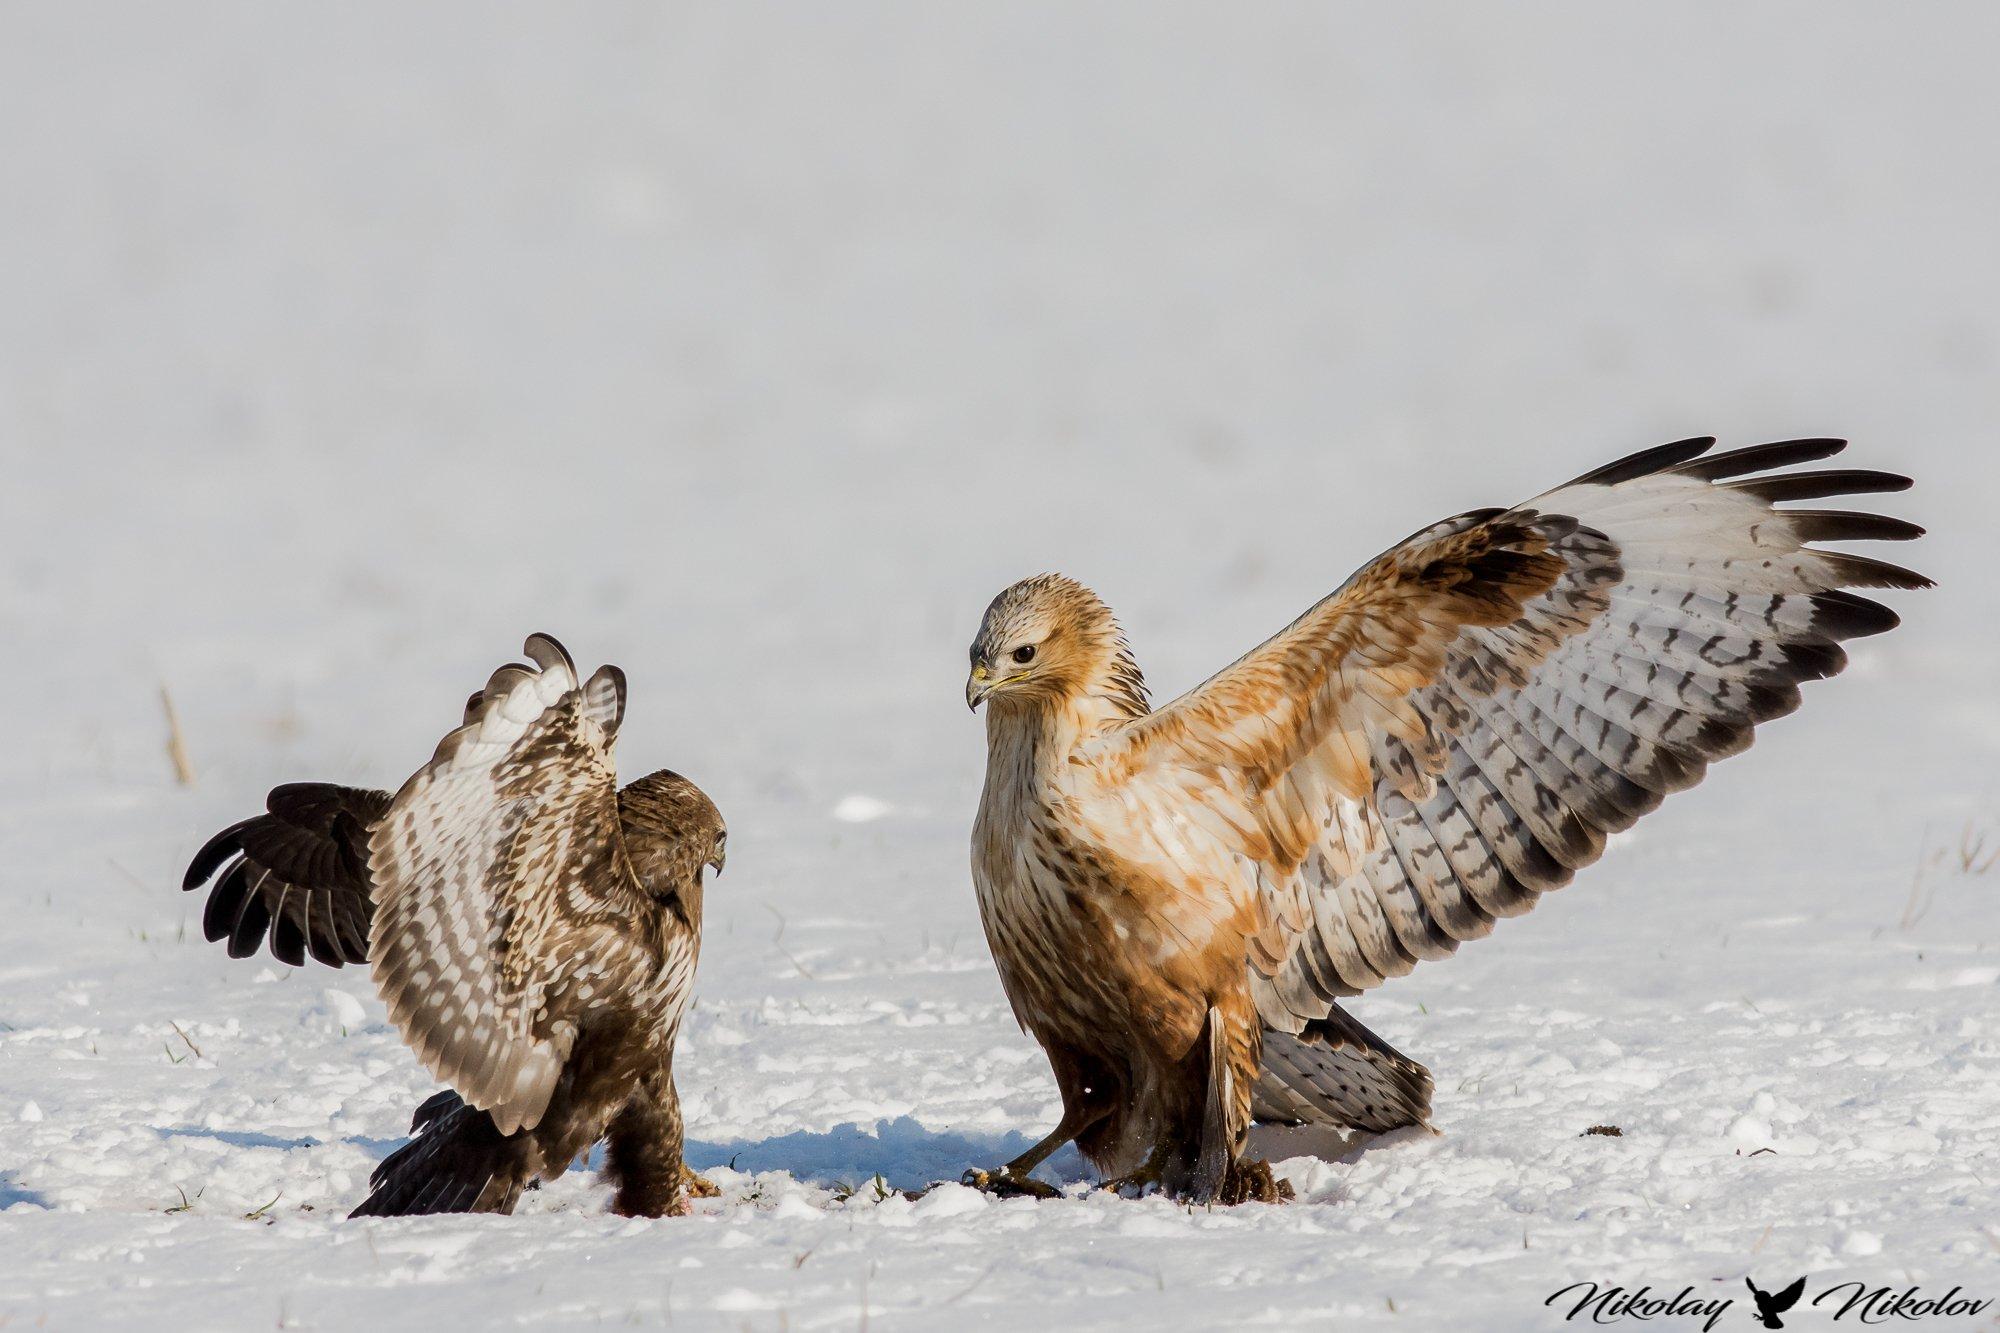 son,father,birds,winter,snow,wildlife,nature,lanscape,action,wings,animals, Nikolay Nikolov